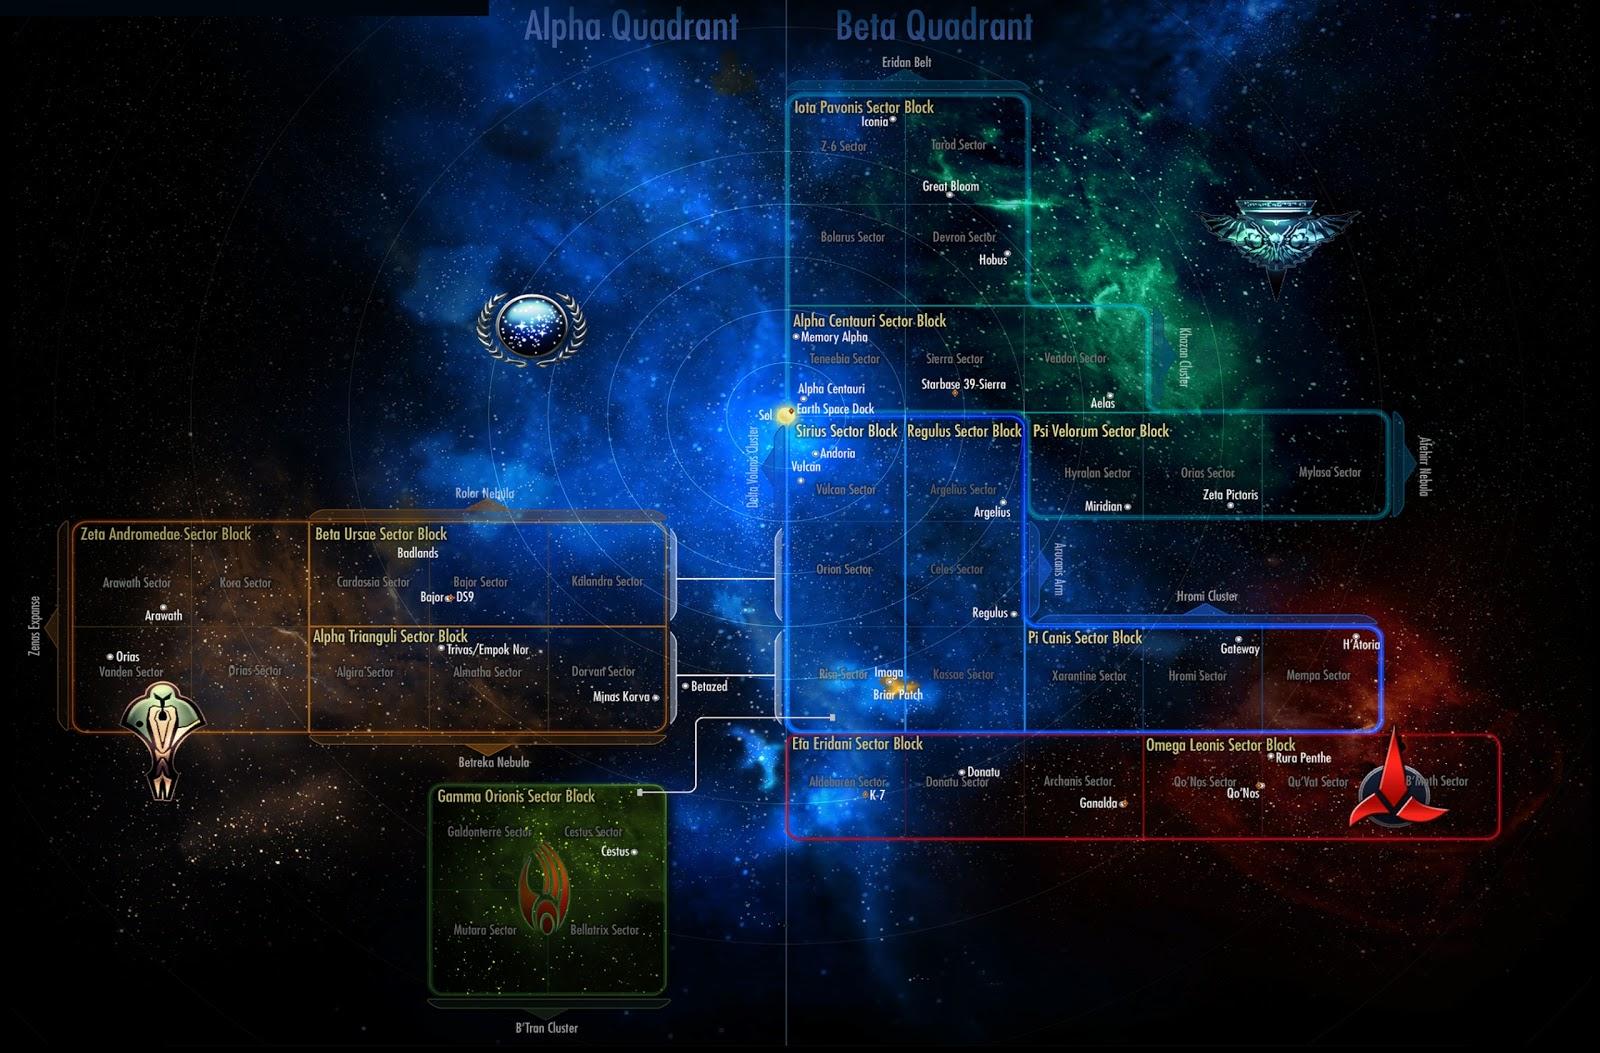 astronomy galaxy map - photo #2